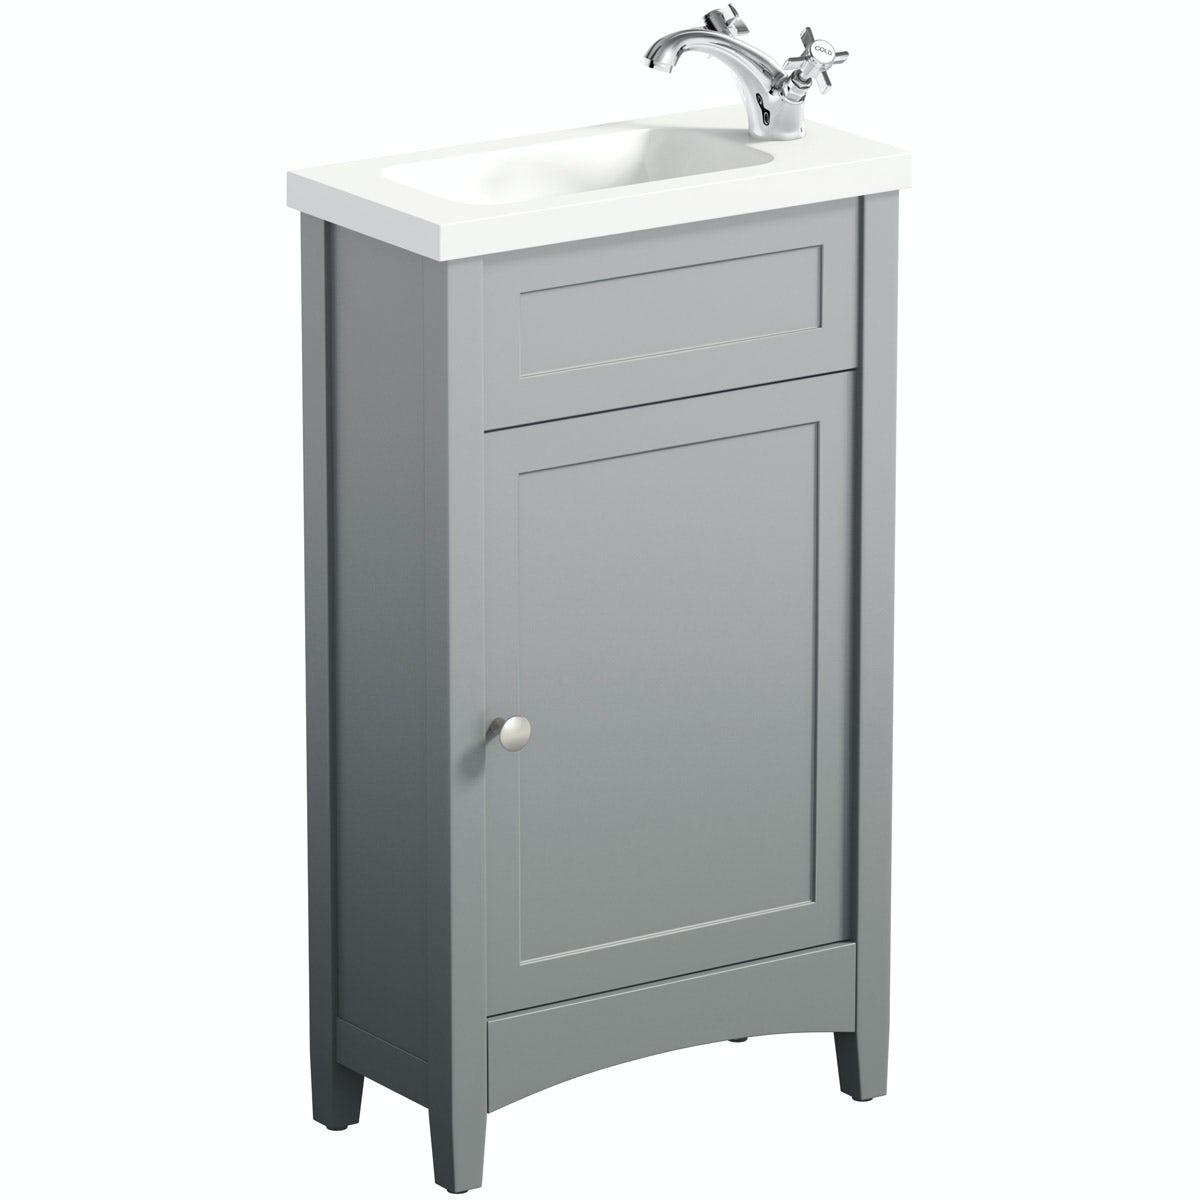 The Bath Co. Camberley Satin Grey Cloakroom Floorstanding Vanity Unit And  Basin 460mm